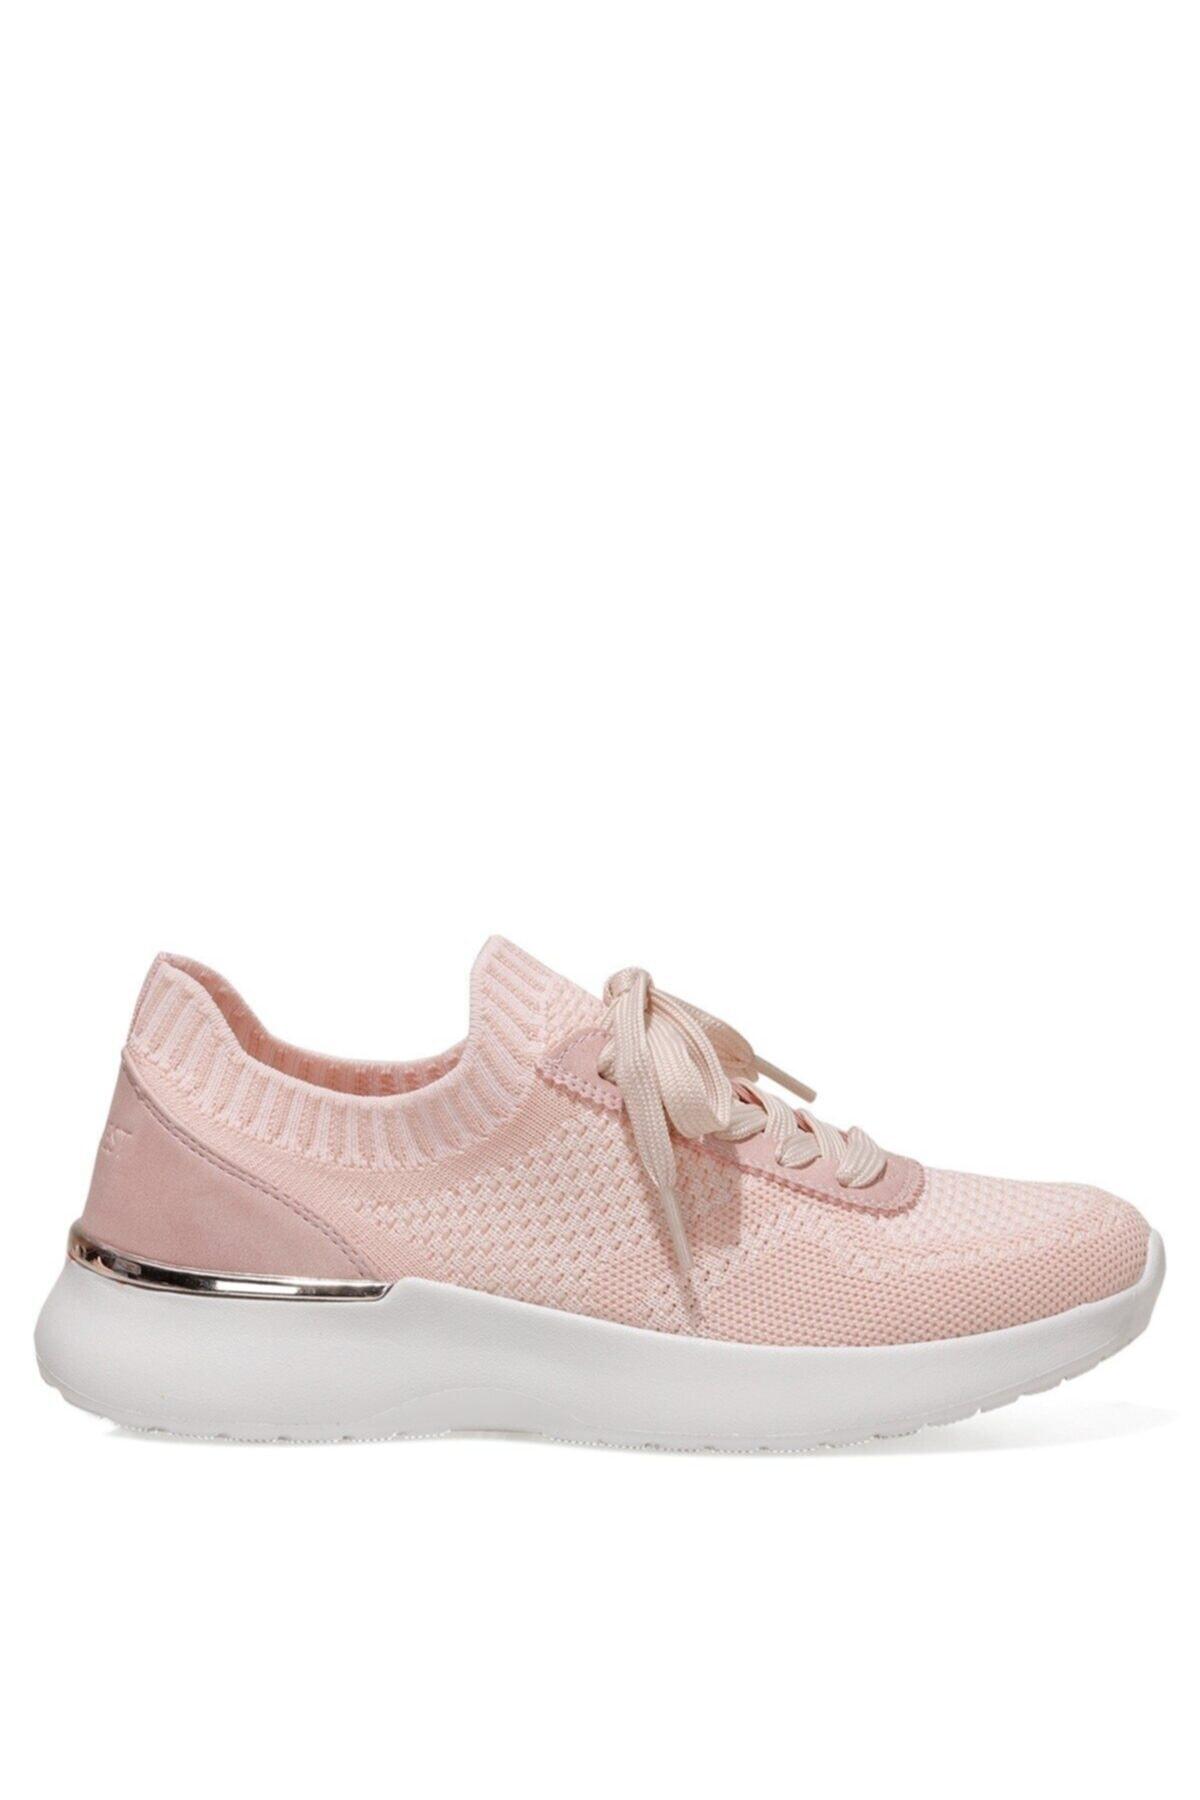 Nine West Mıesse 1fx Pembe Kadın Sneaker Ayakkabı 1